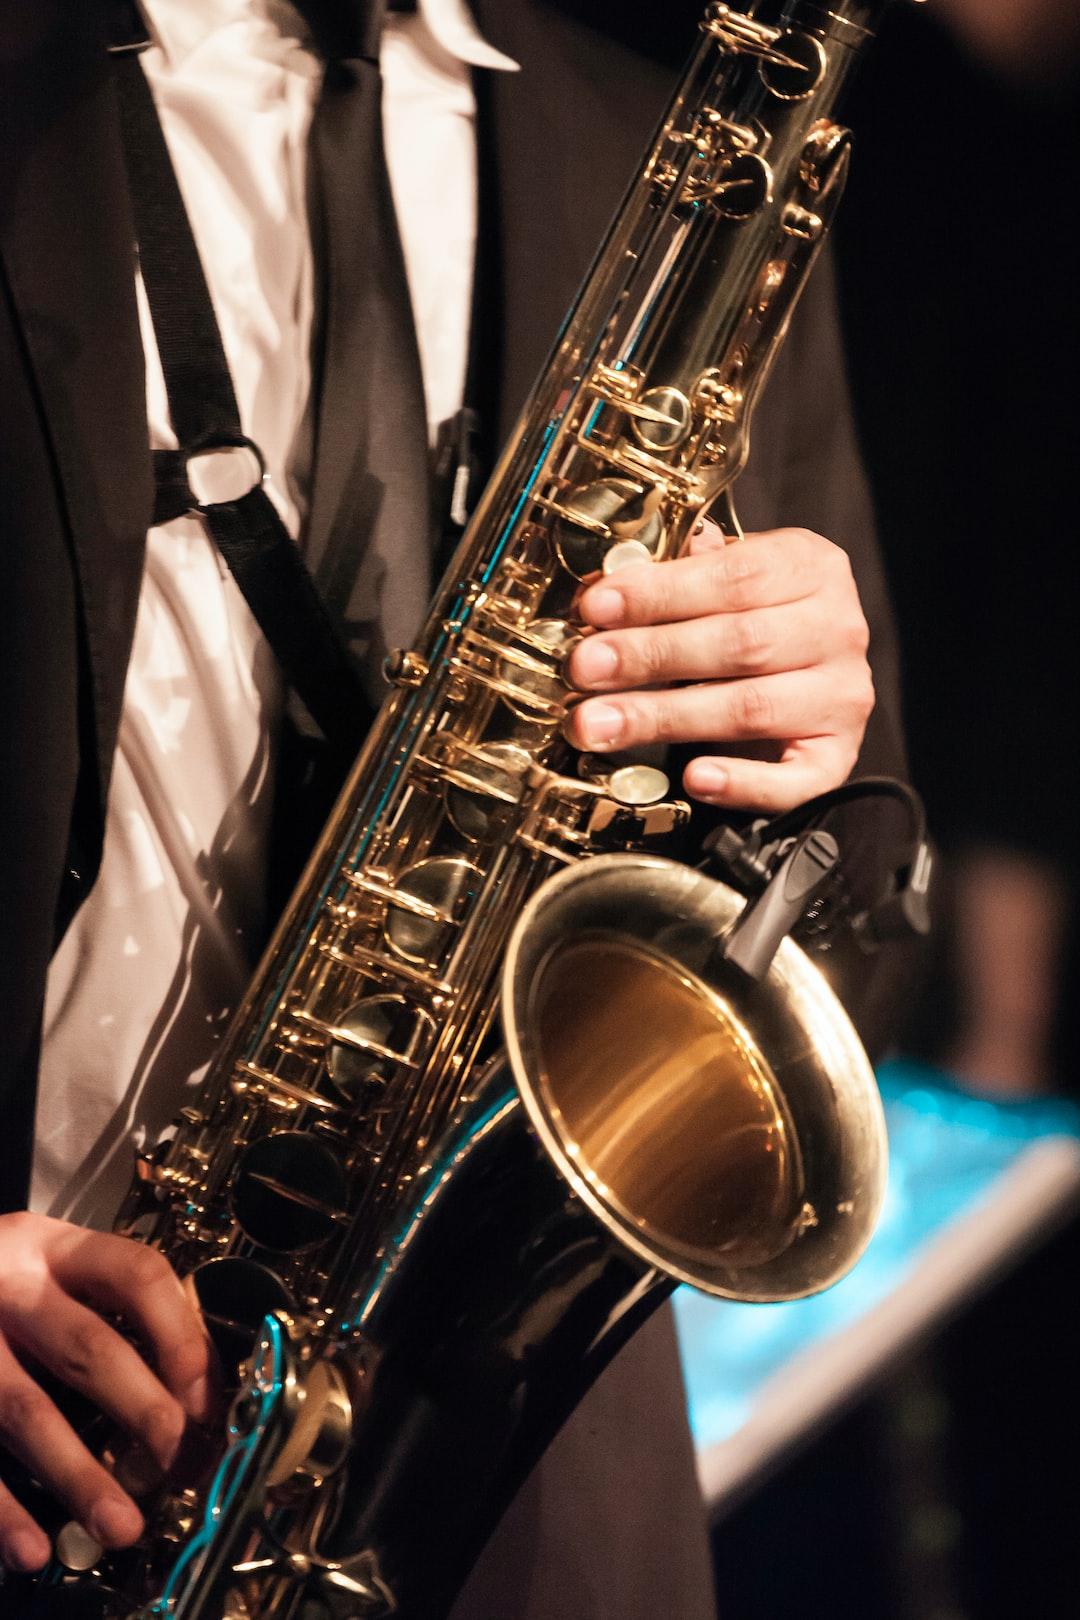 Saxophone player close-up